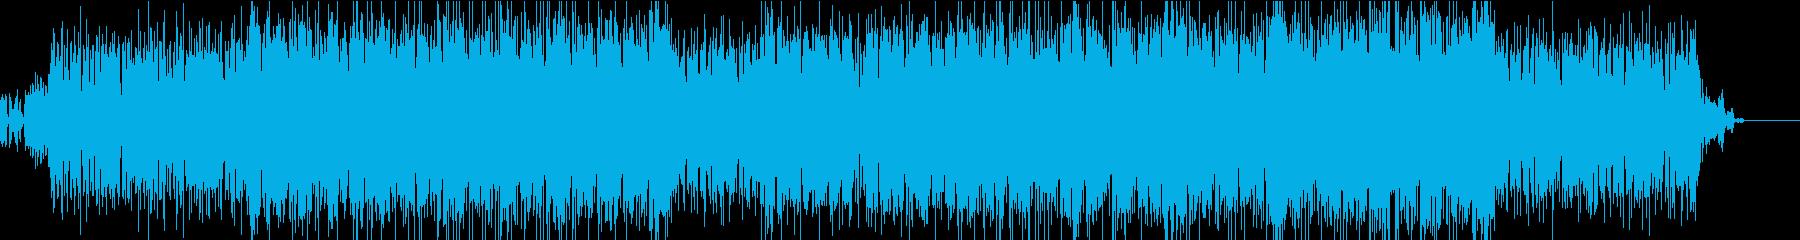 House / Dance Rock's reproduced waveform